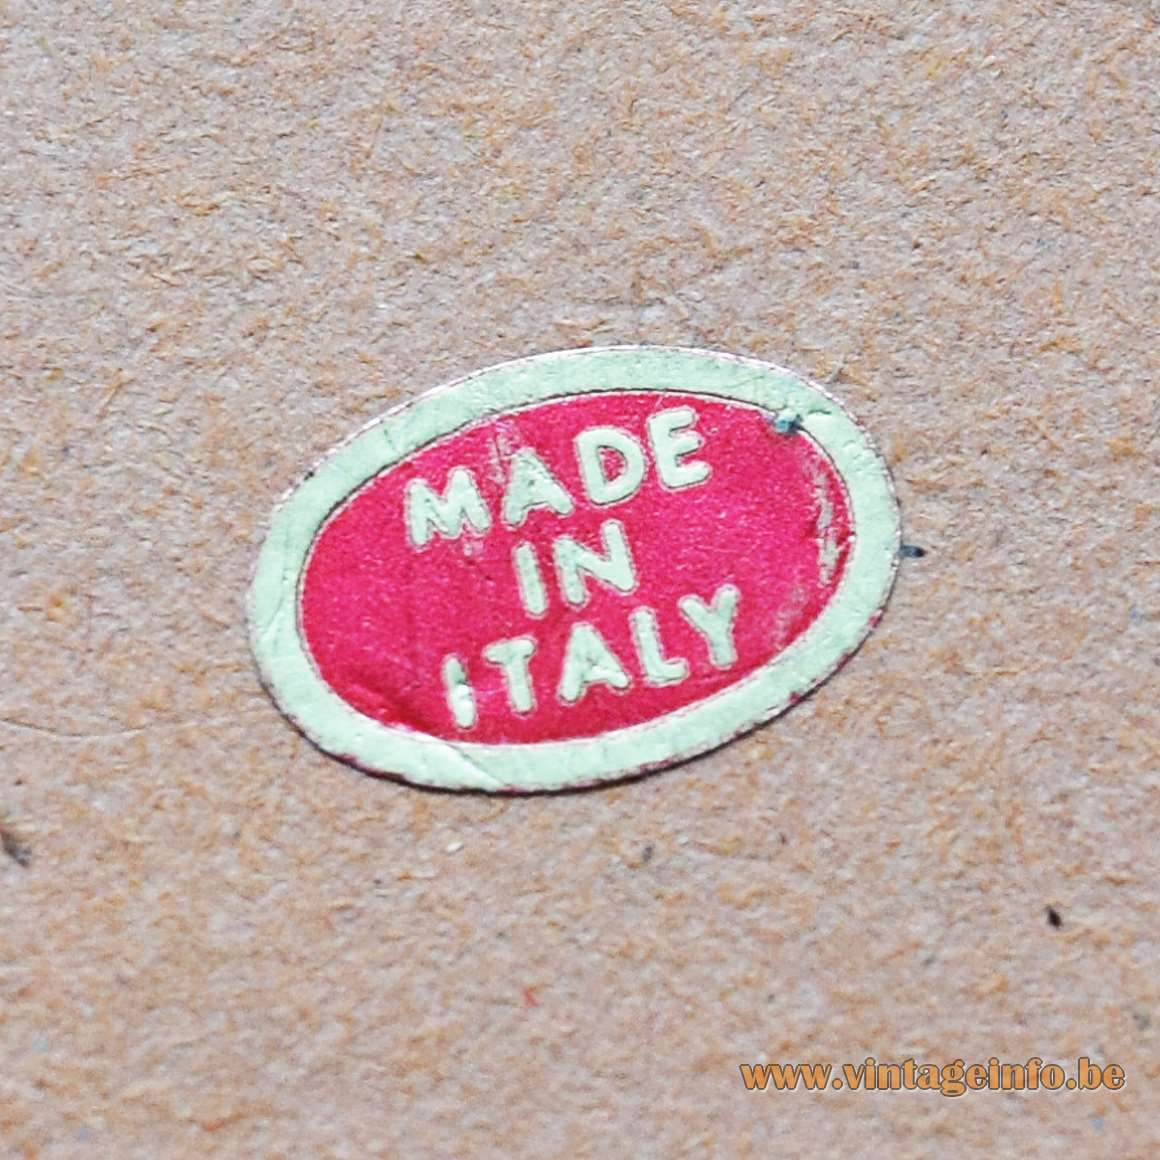 1960s Felt Clown Bobblehead Table Lamp styrofoam cardboard fabric Made in Italy label 1970s